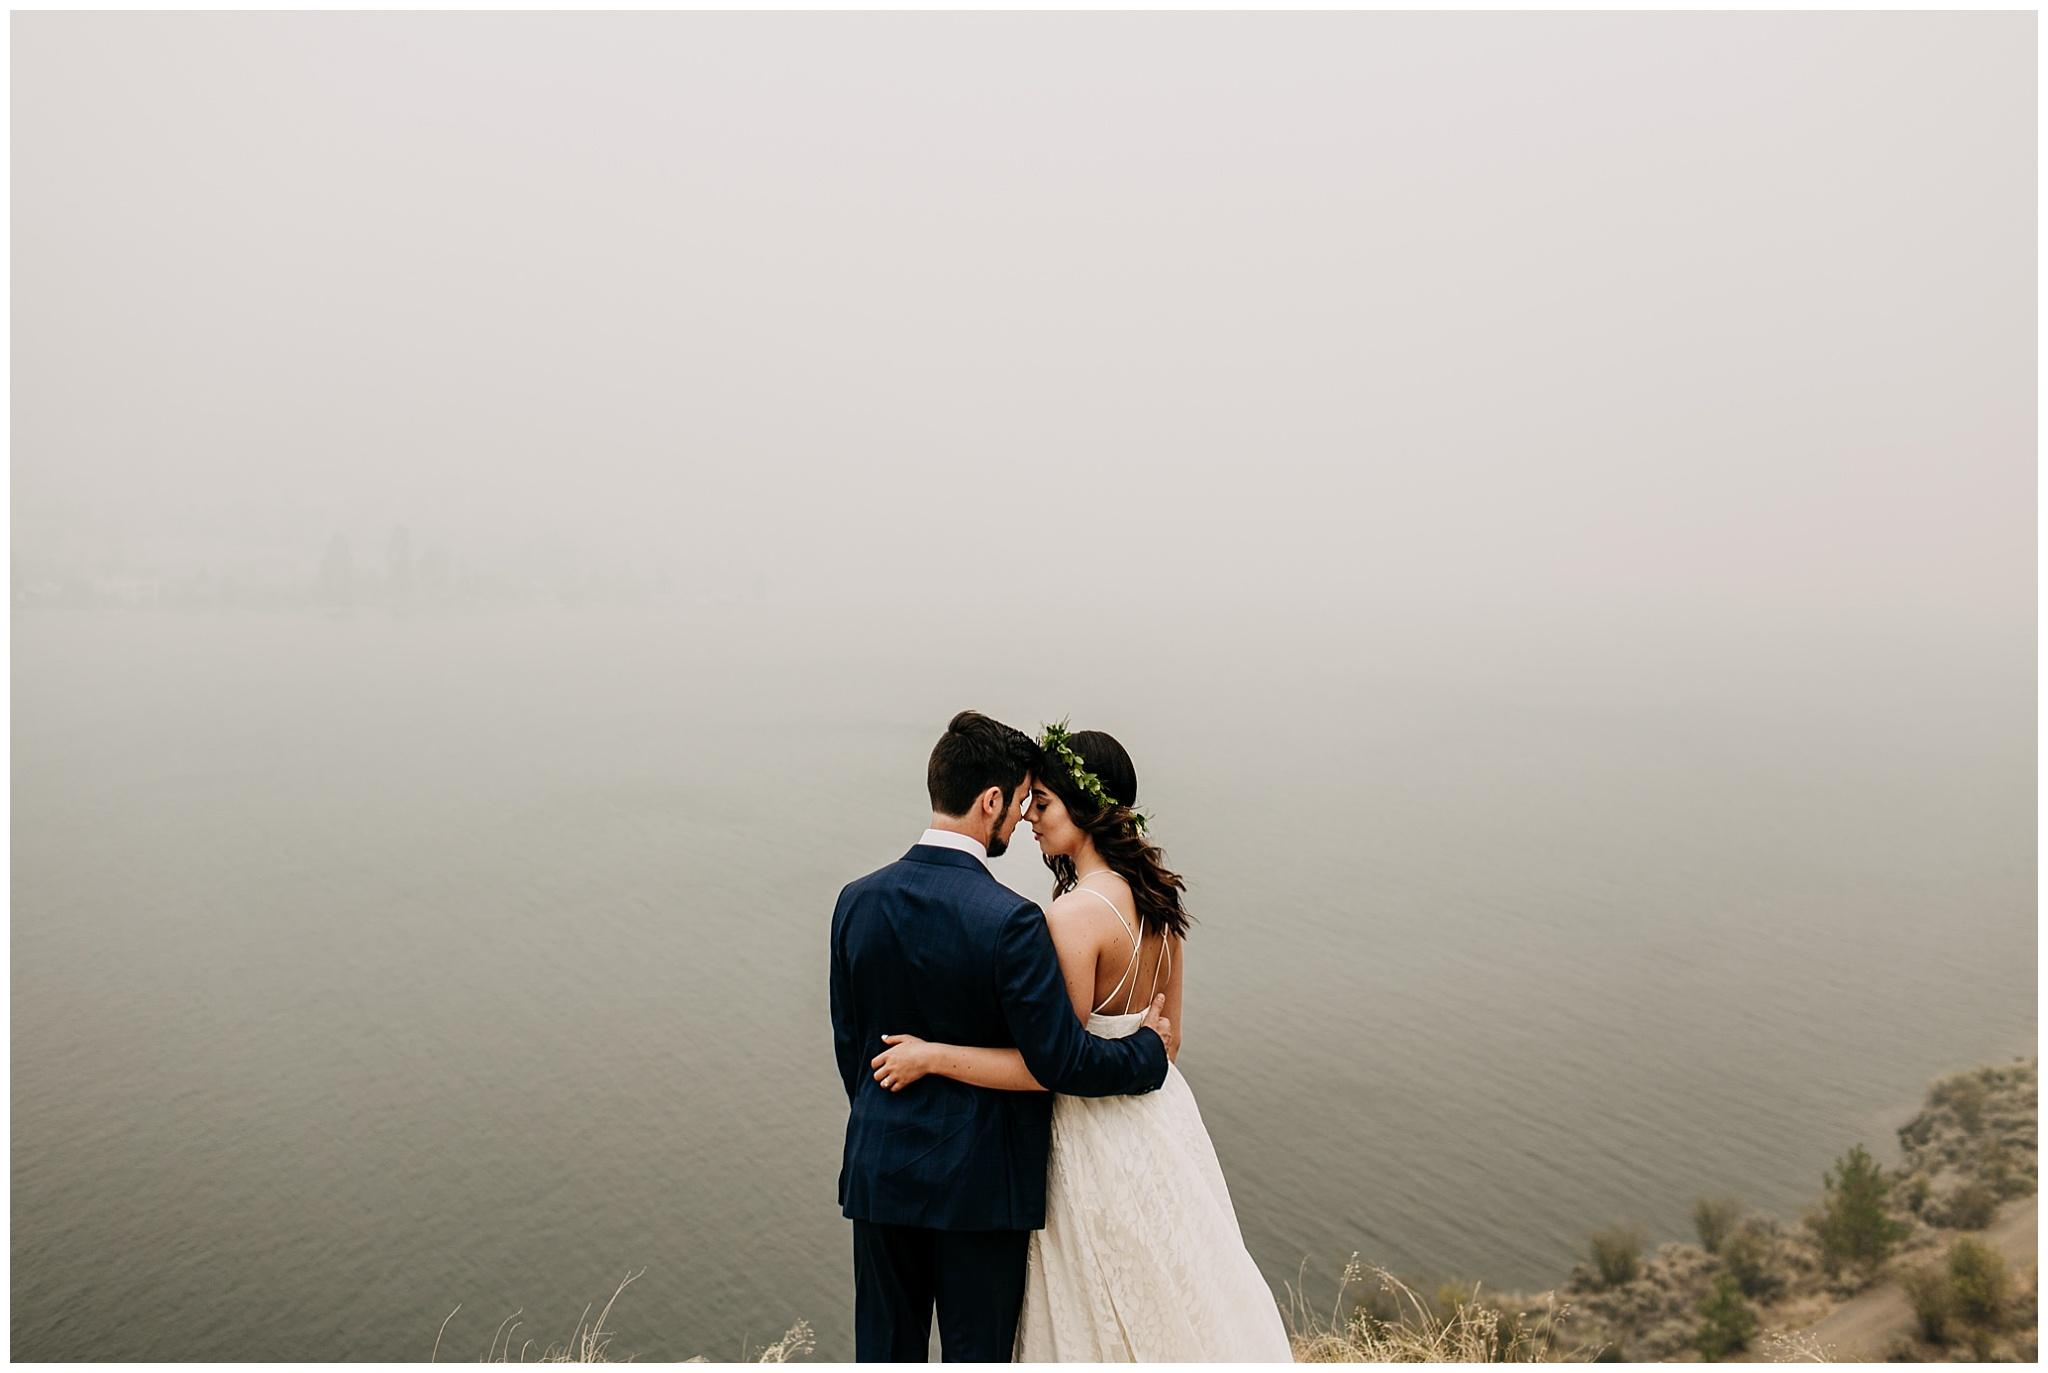 bride and groom intimate portrait at linden gardens wedding in kelowna